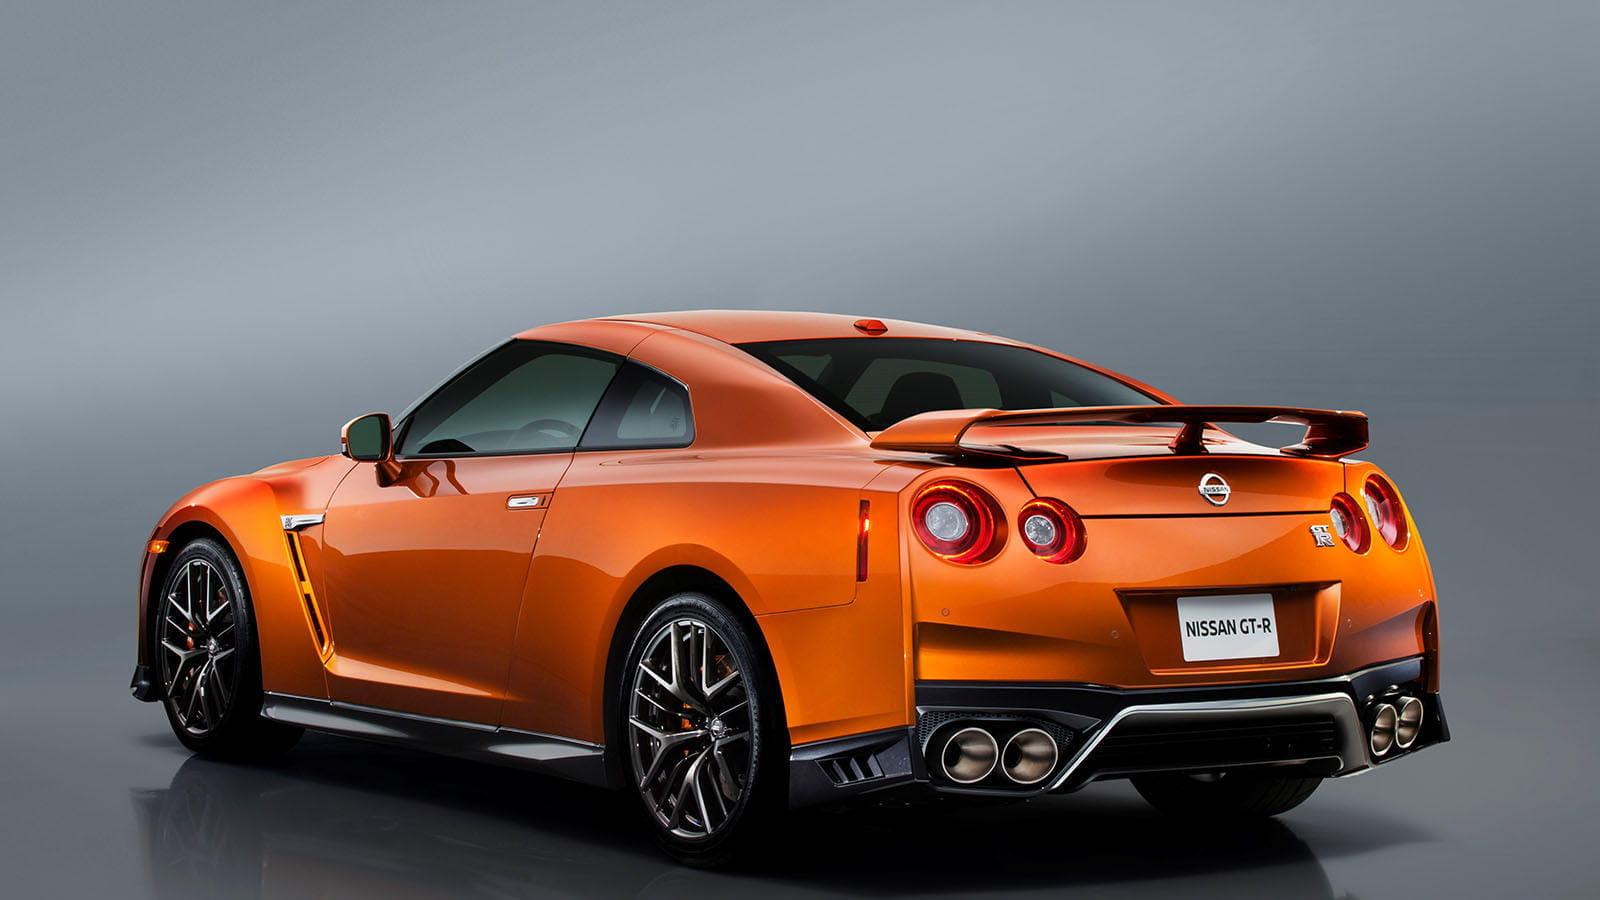 Nissan nissan deportivos nissan gt r nissan gt r r35 tuning cars - An Error Occurred